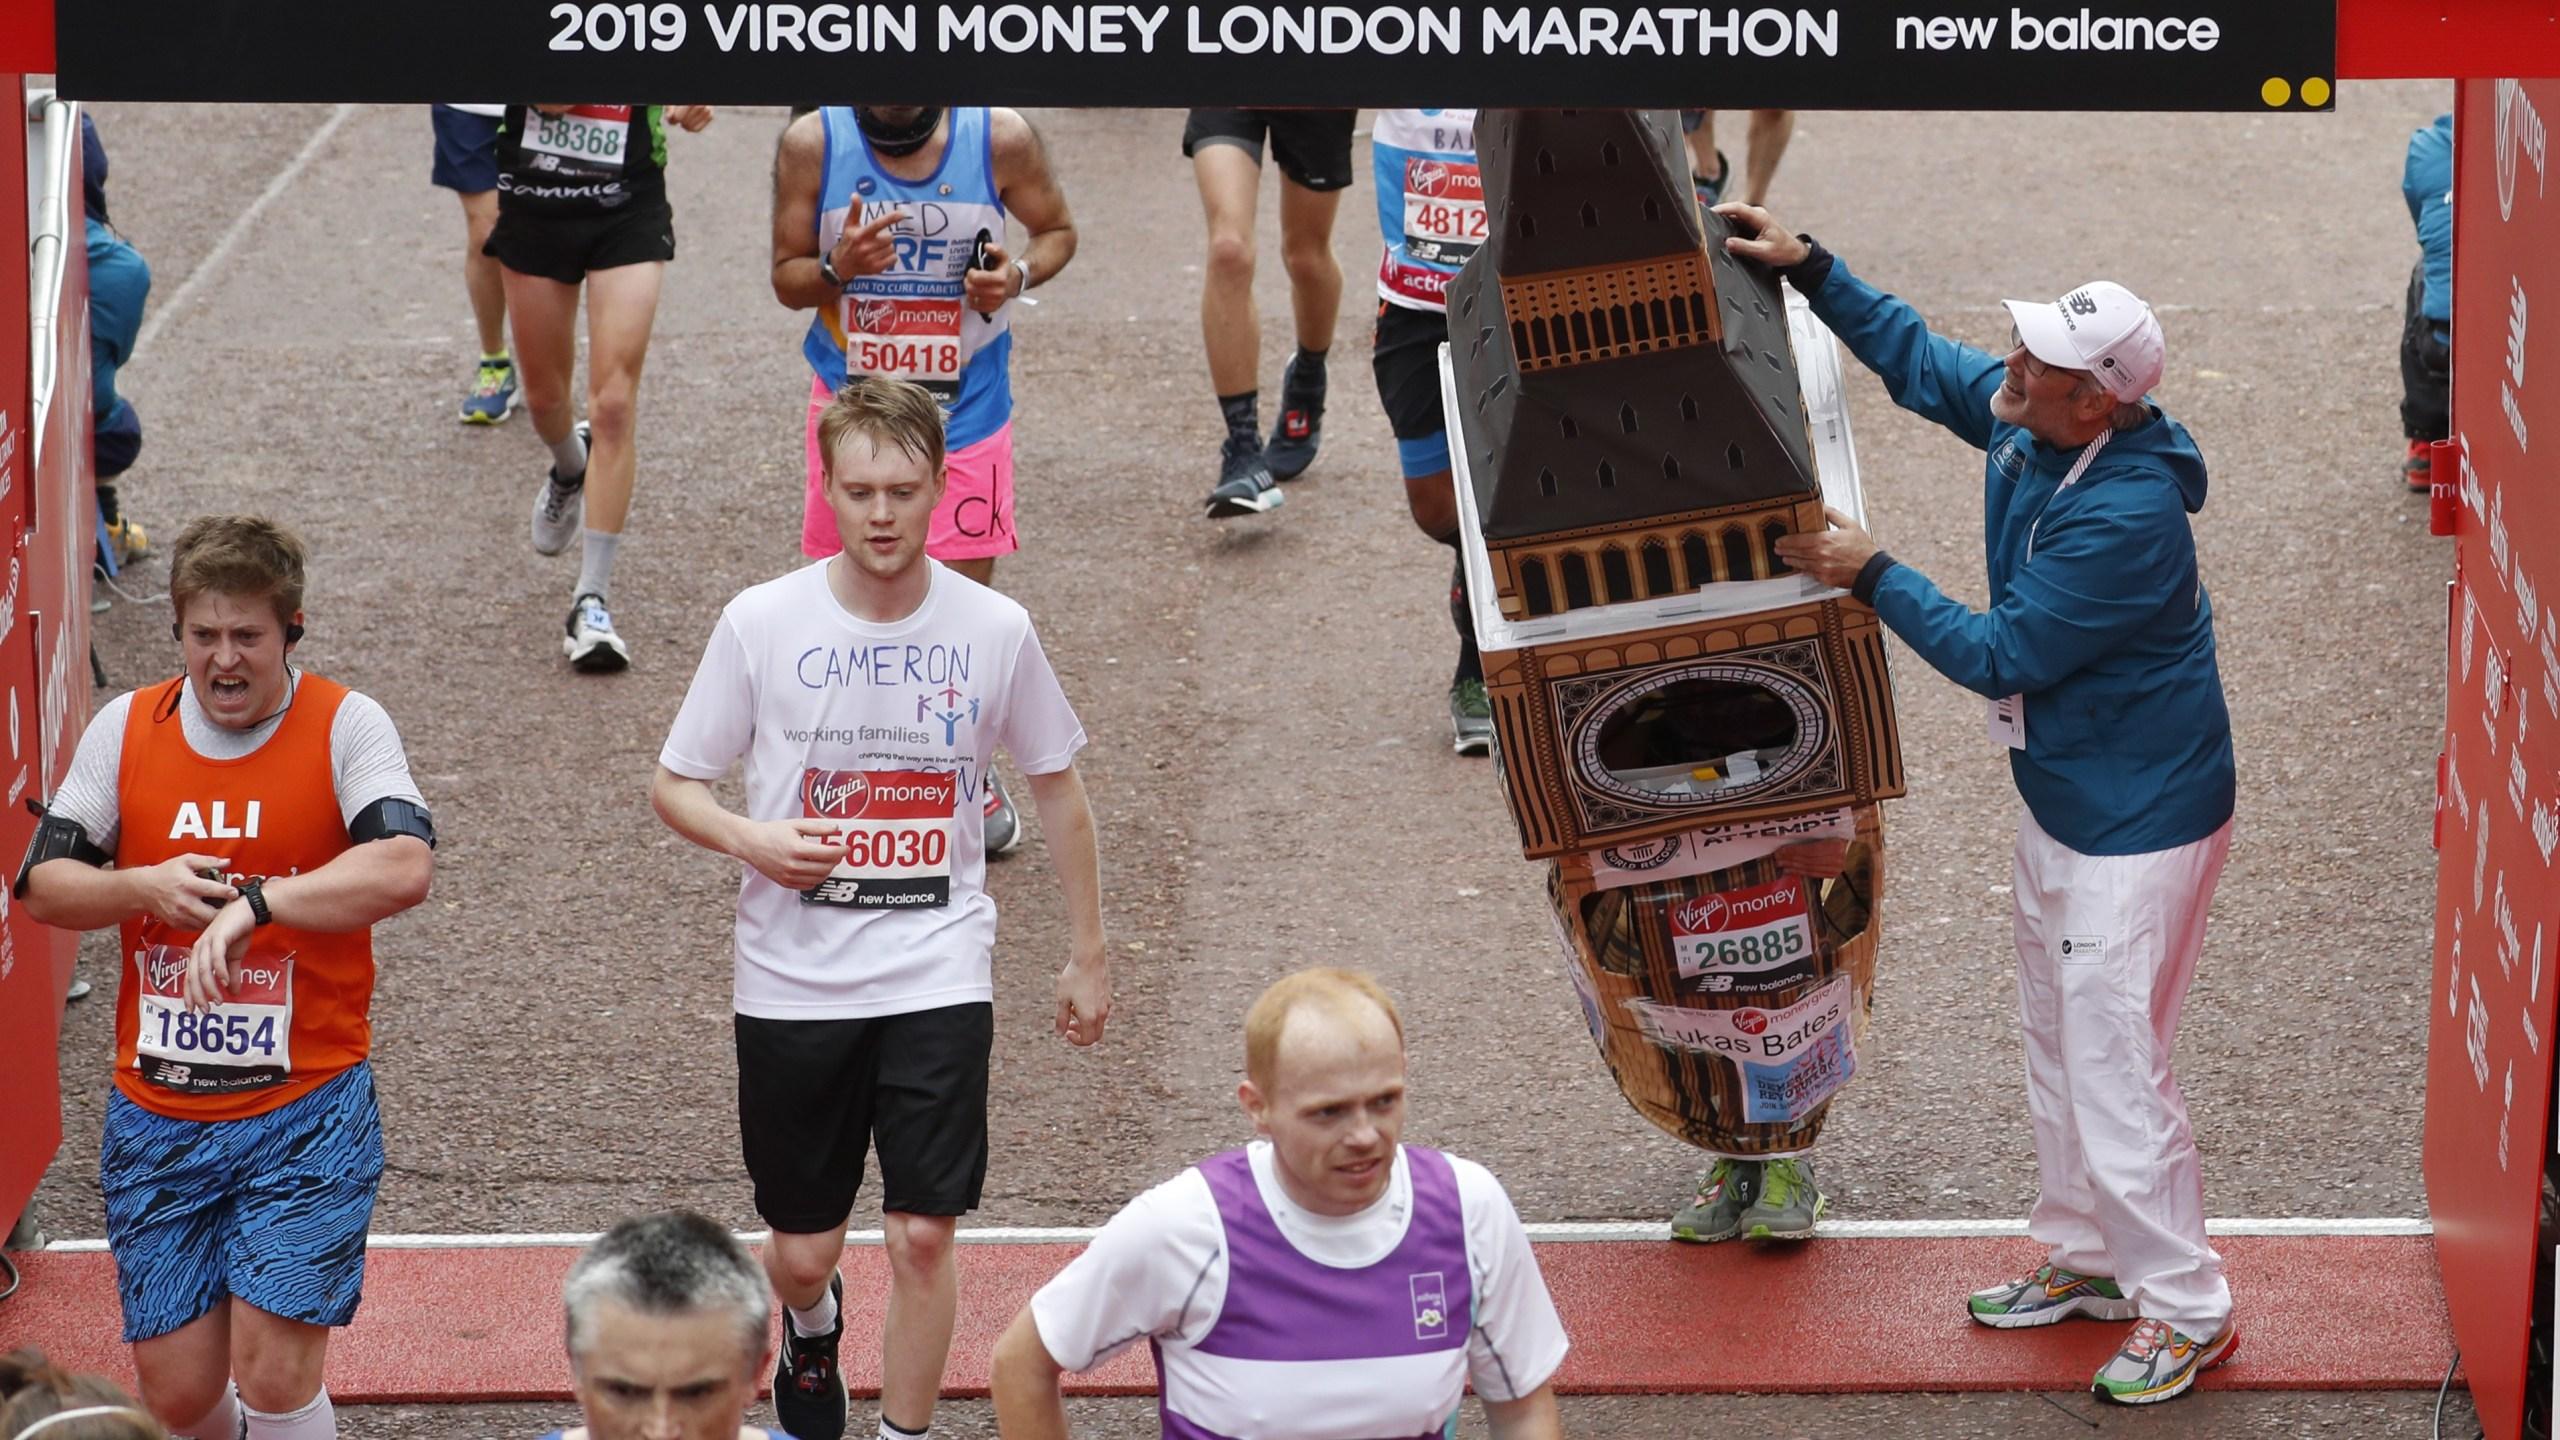 Big Ben London Marathon